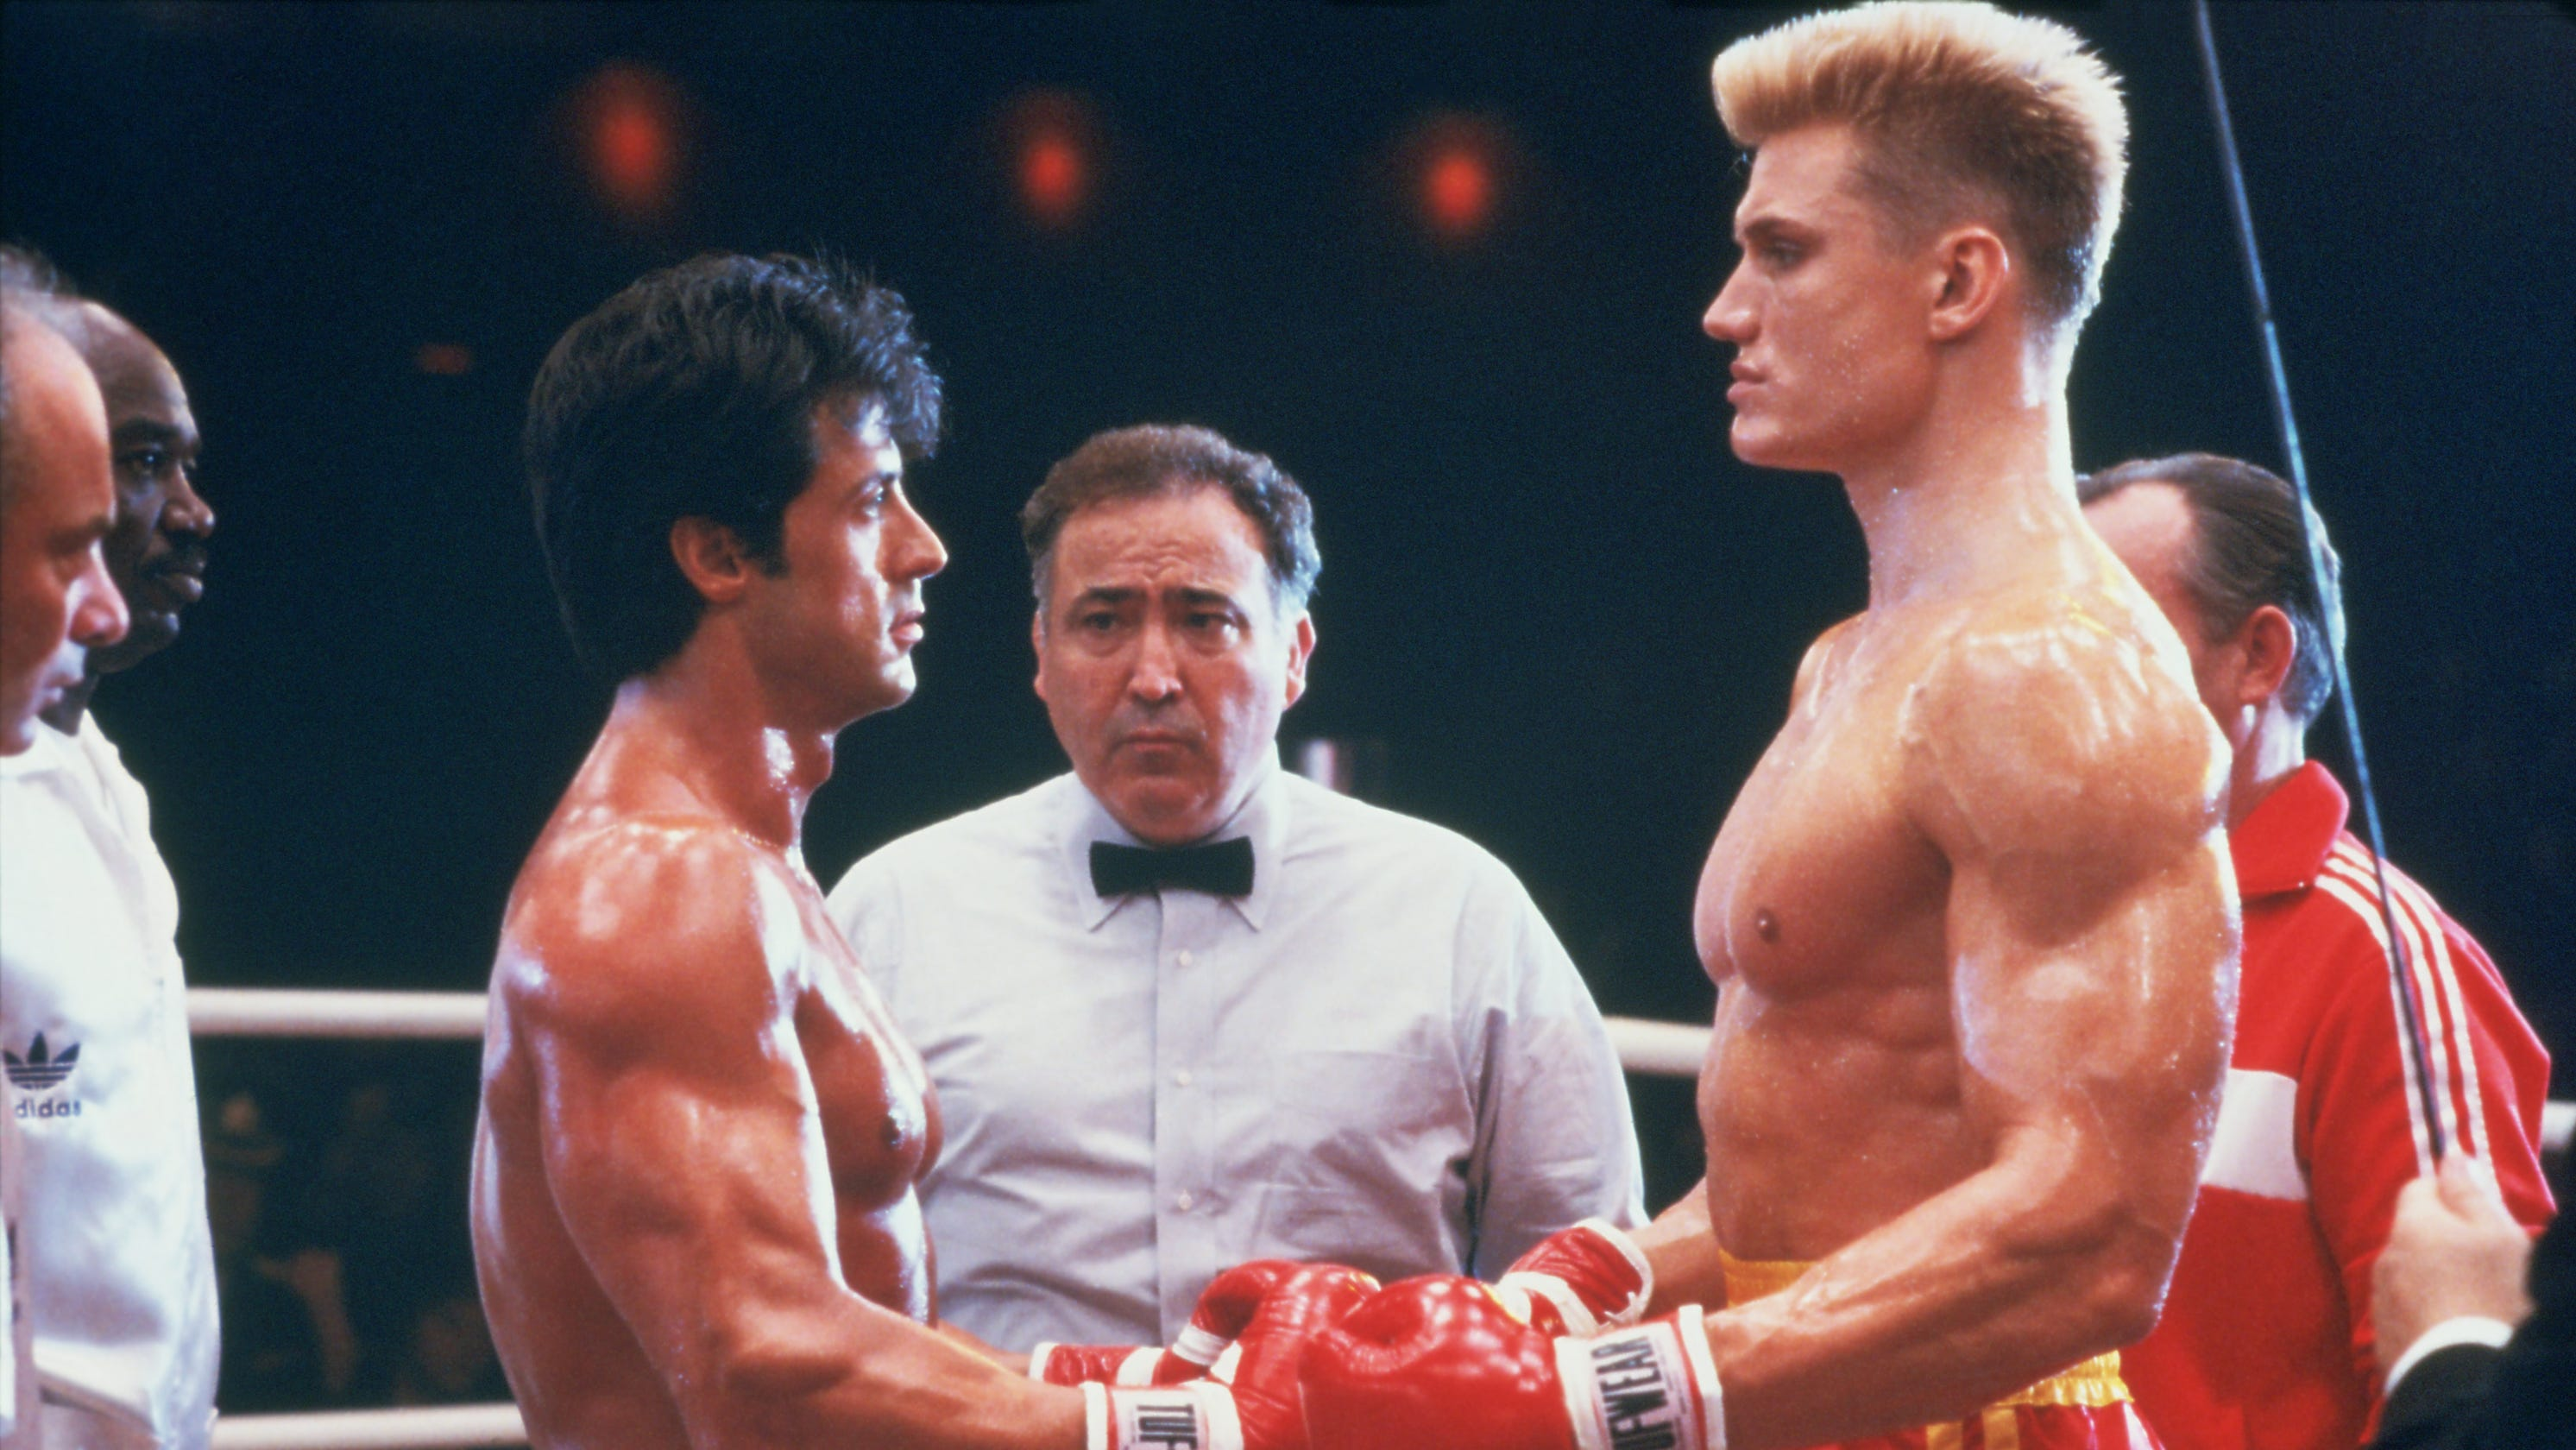 fdad4d4dfce101 How  Creed 2  rewrites Dolph Lundgren Ivan Drago s  Rocky IV  cold saga